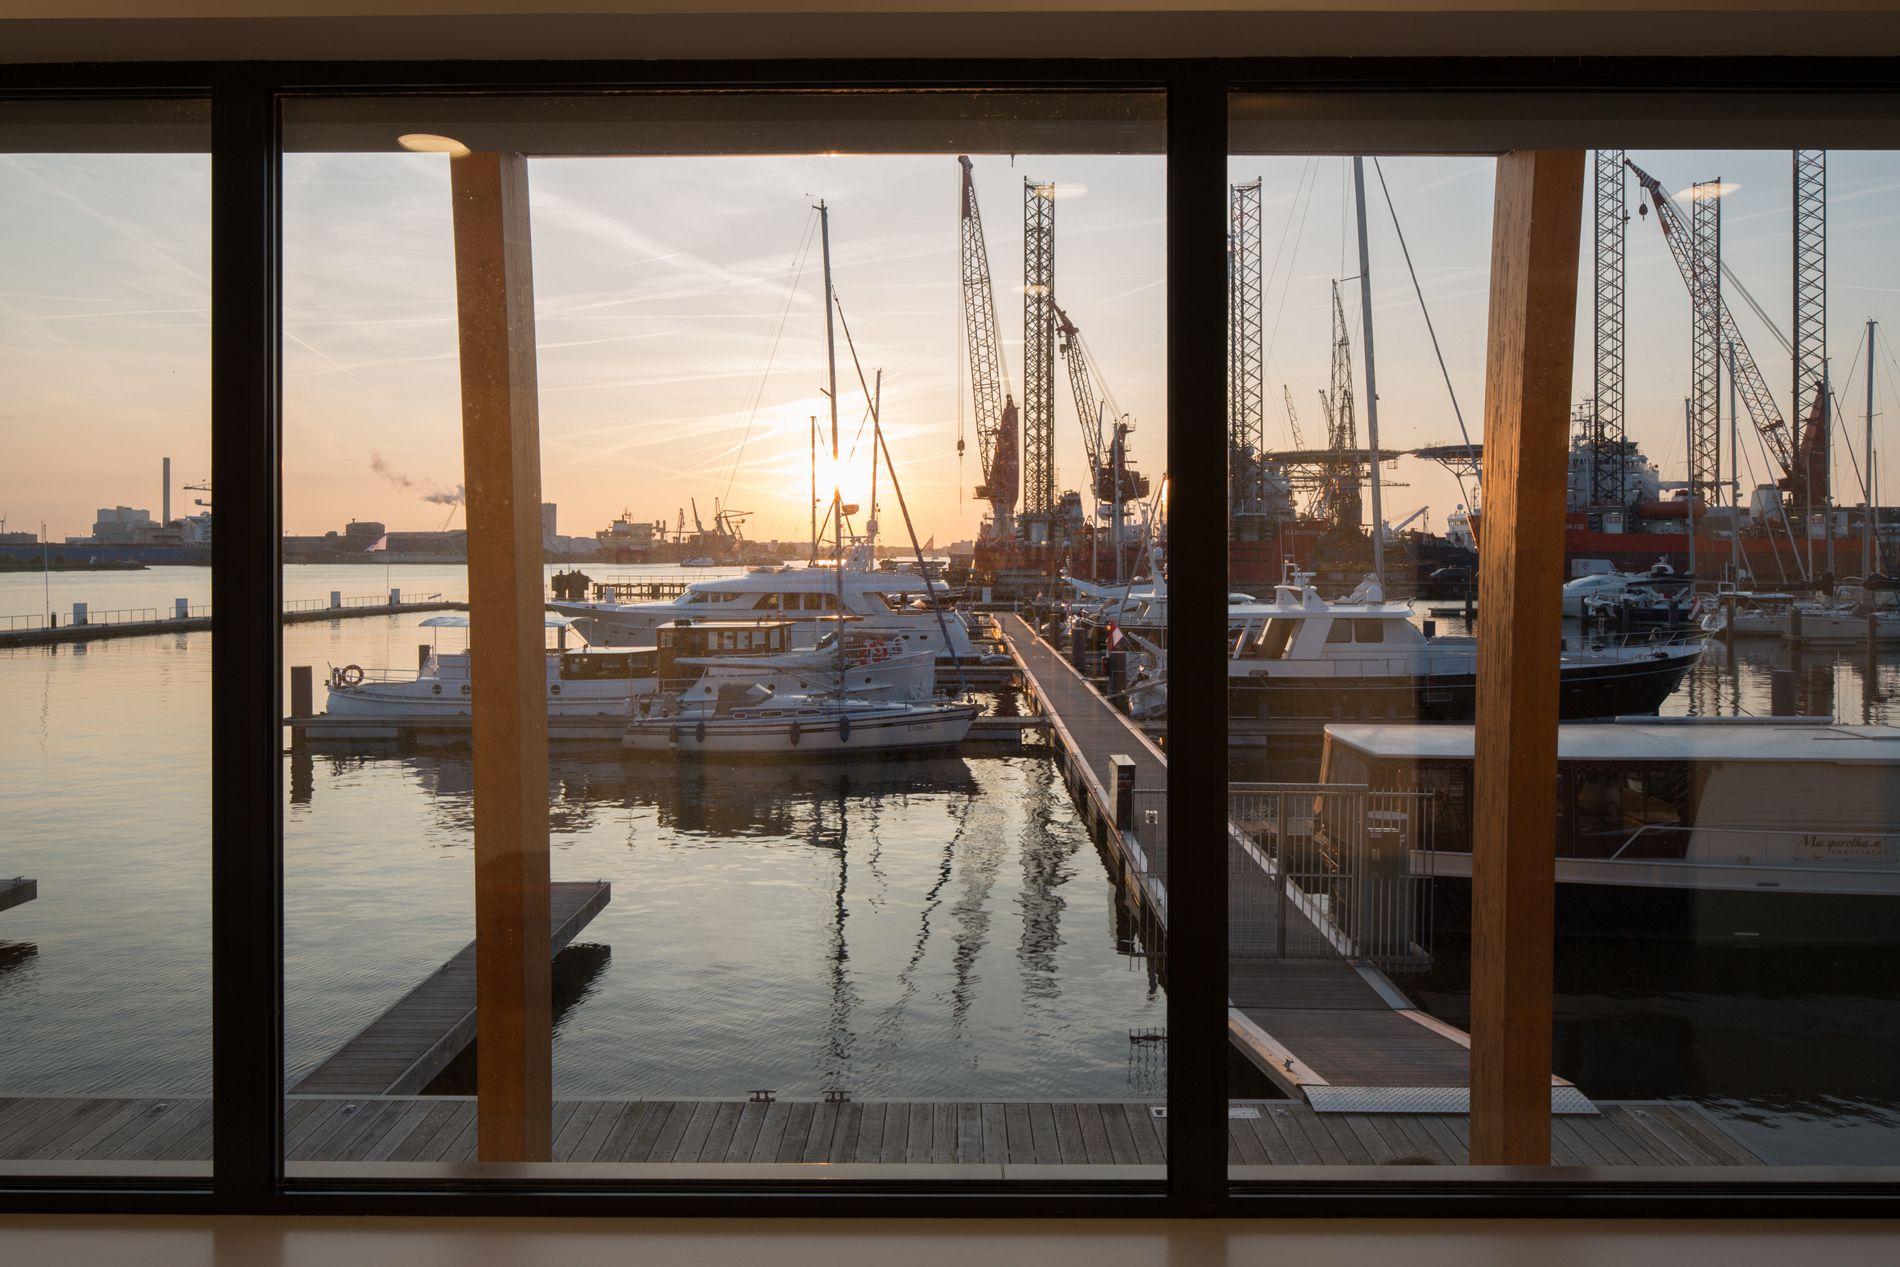 amsterdam marina, search